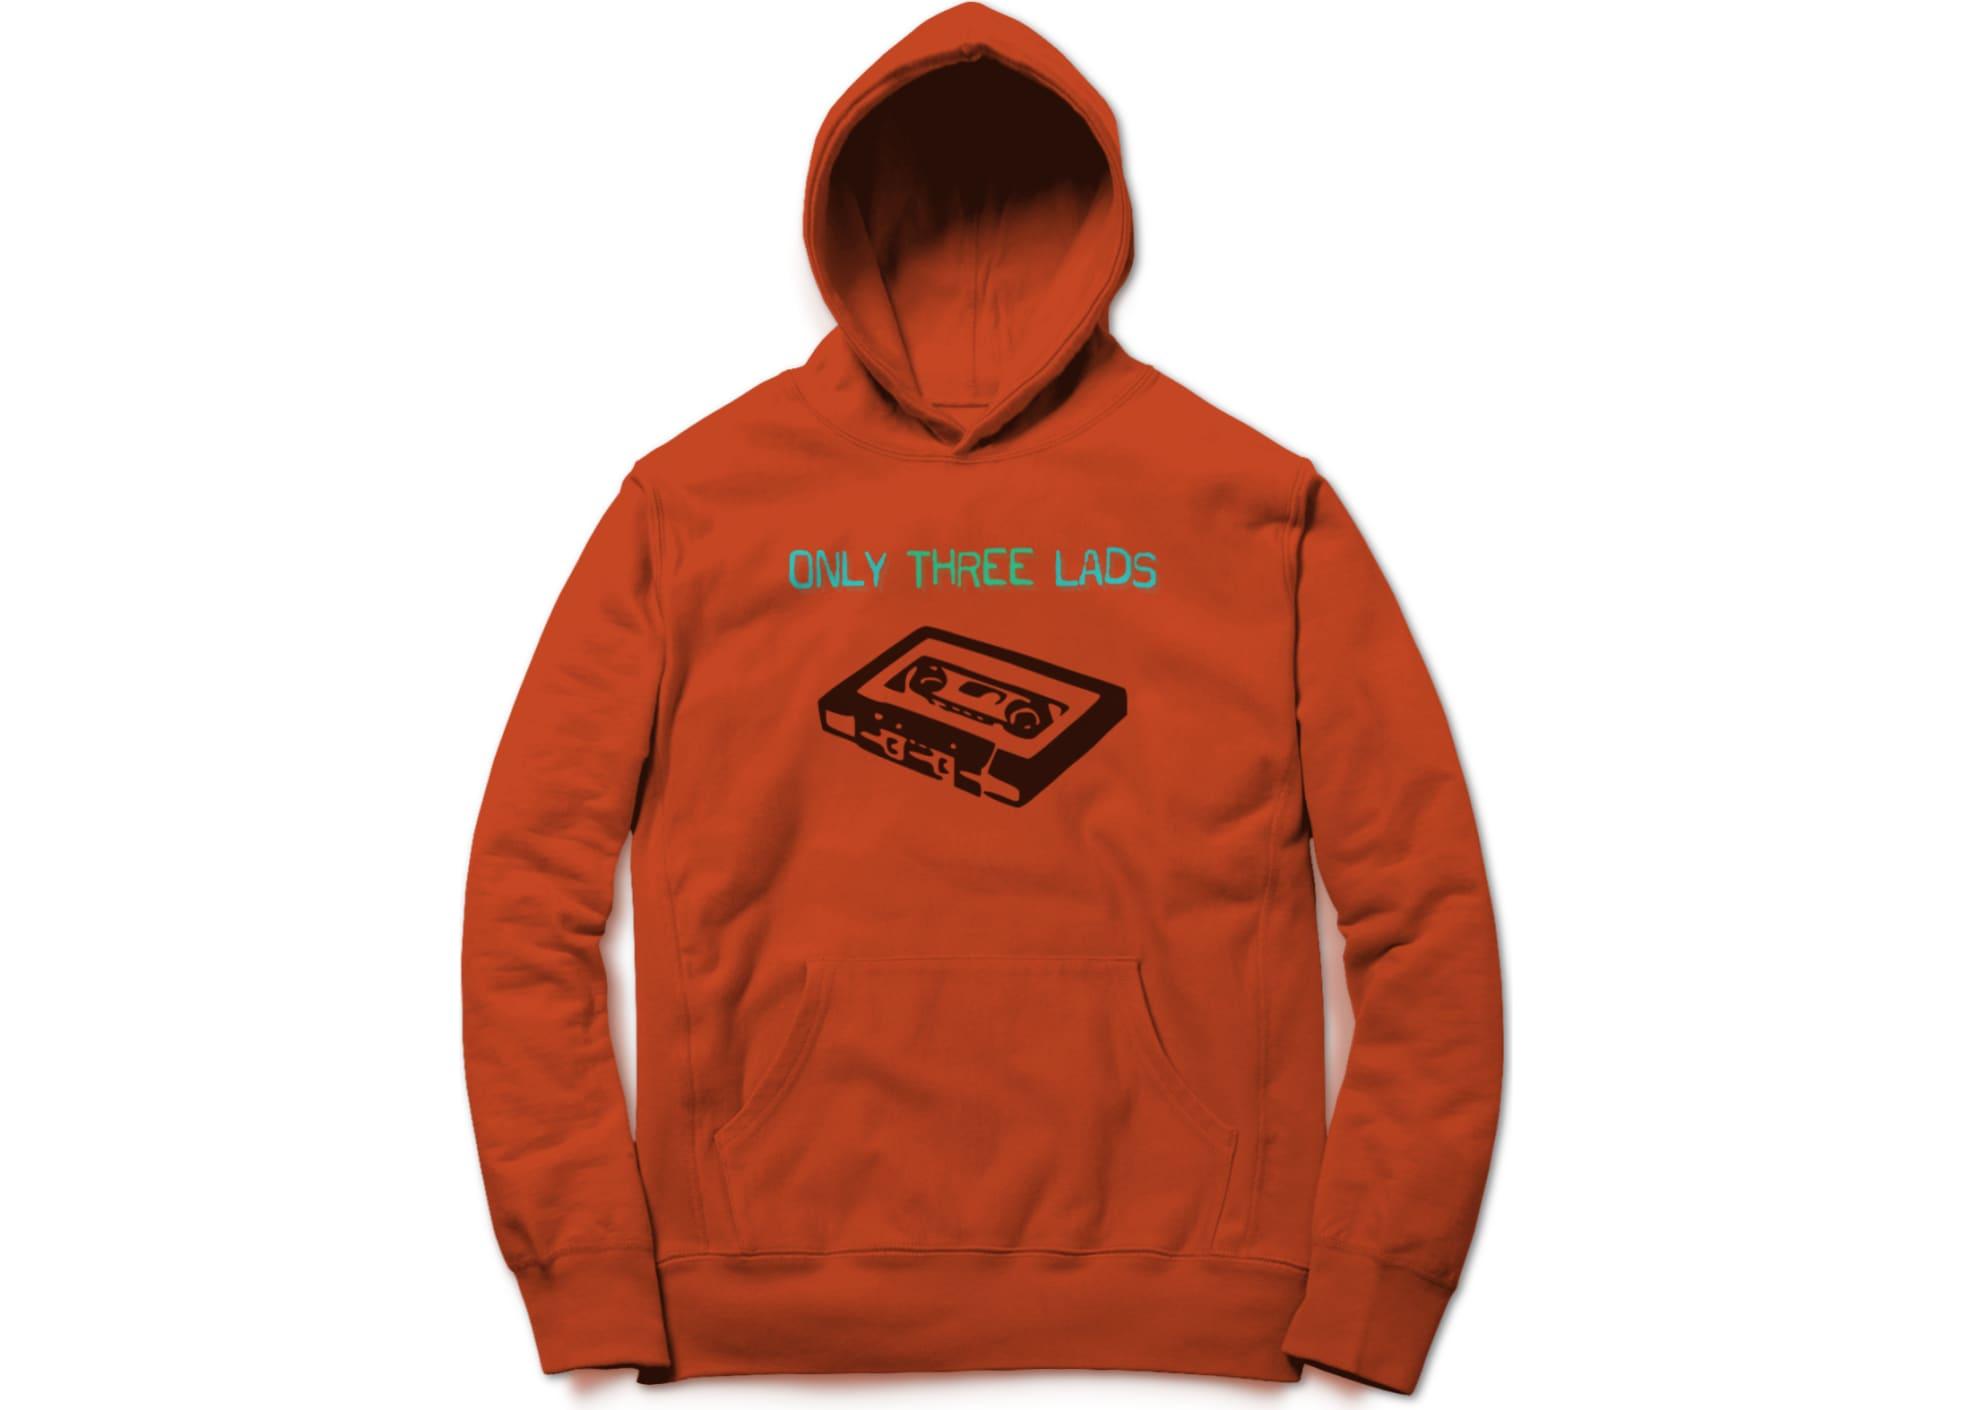 Only three lads o3l   tape  orange  1579510820